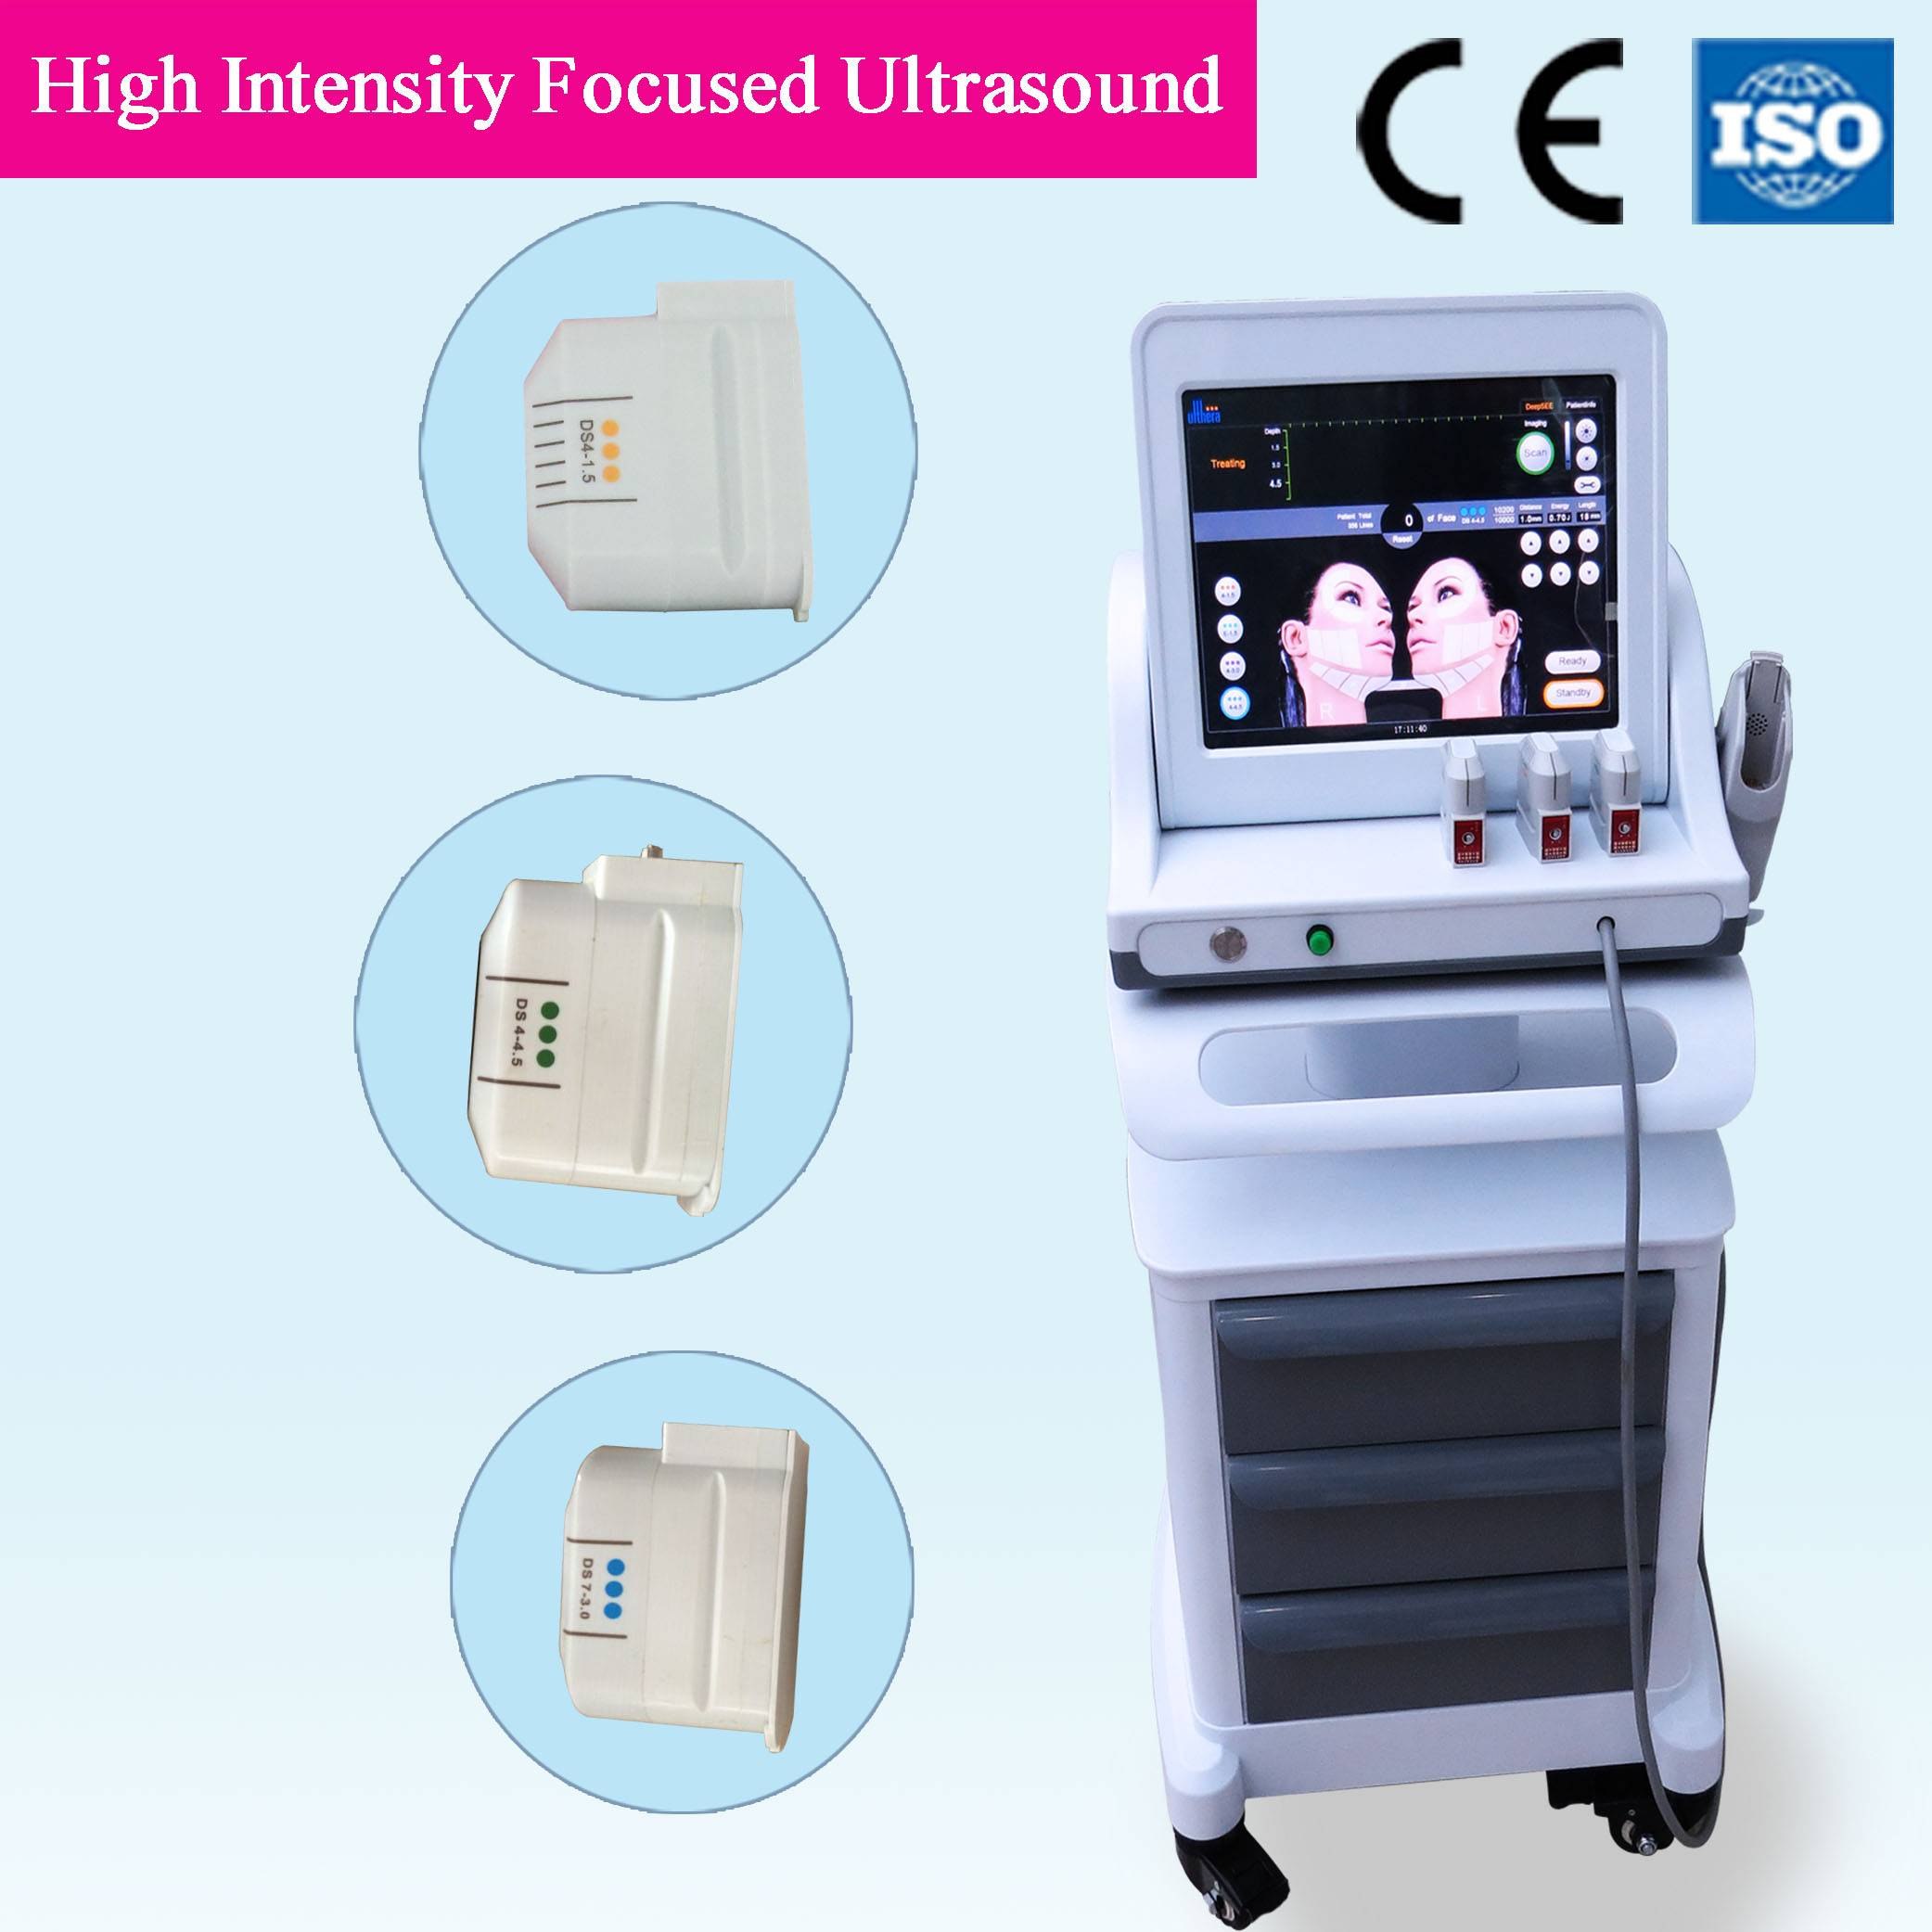 Hifu Laser Device for Skin Rejuvenation